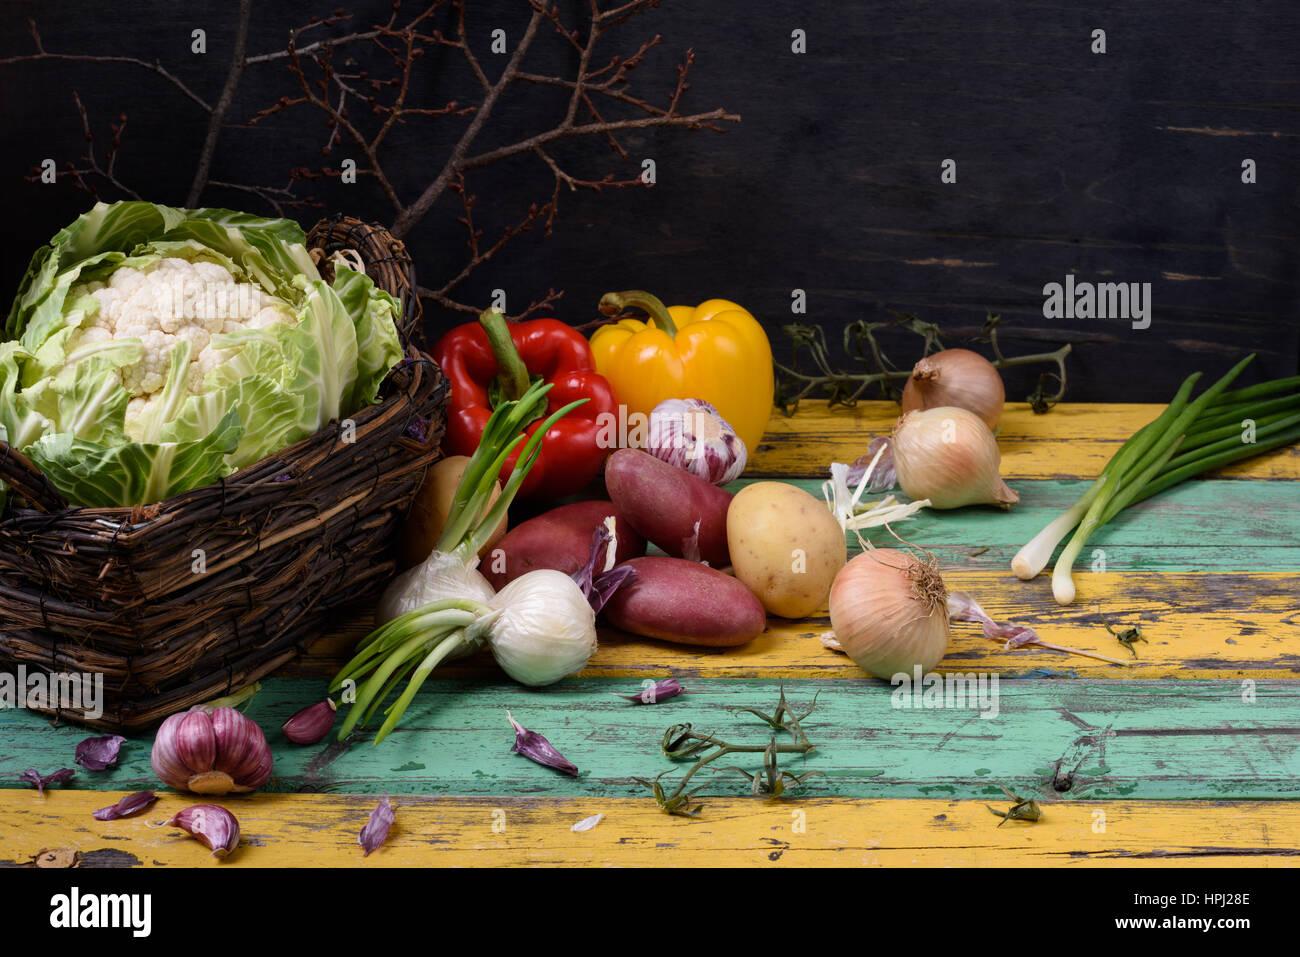 Organic seasonal vegetable ingredients over colorful wooden table. Healthy food or vegetarian diet concept. - Stock Image